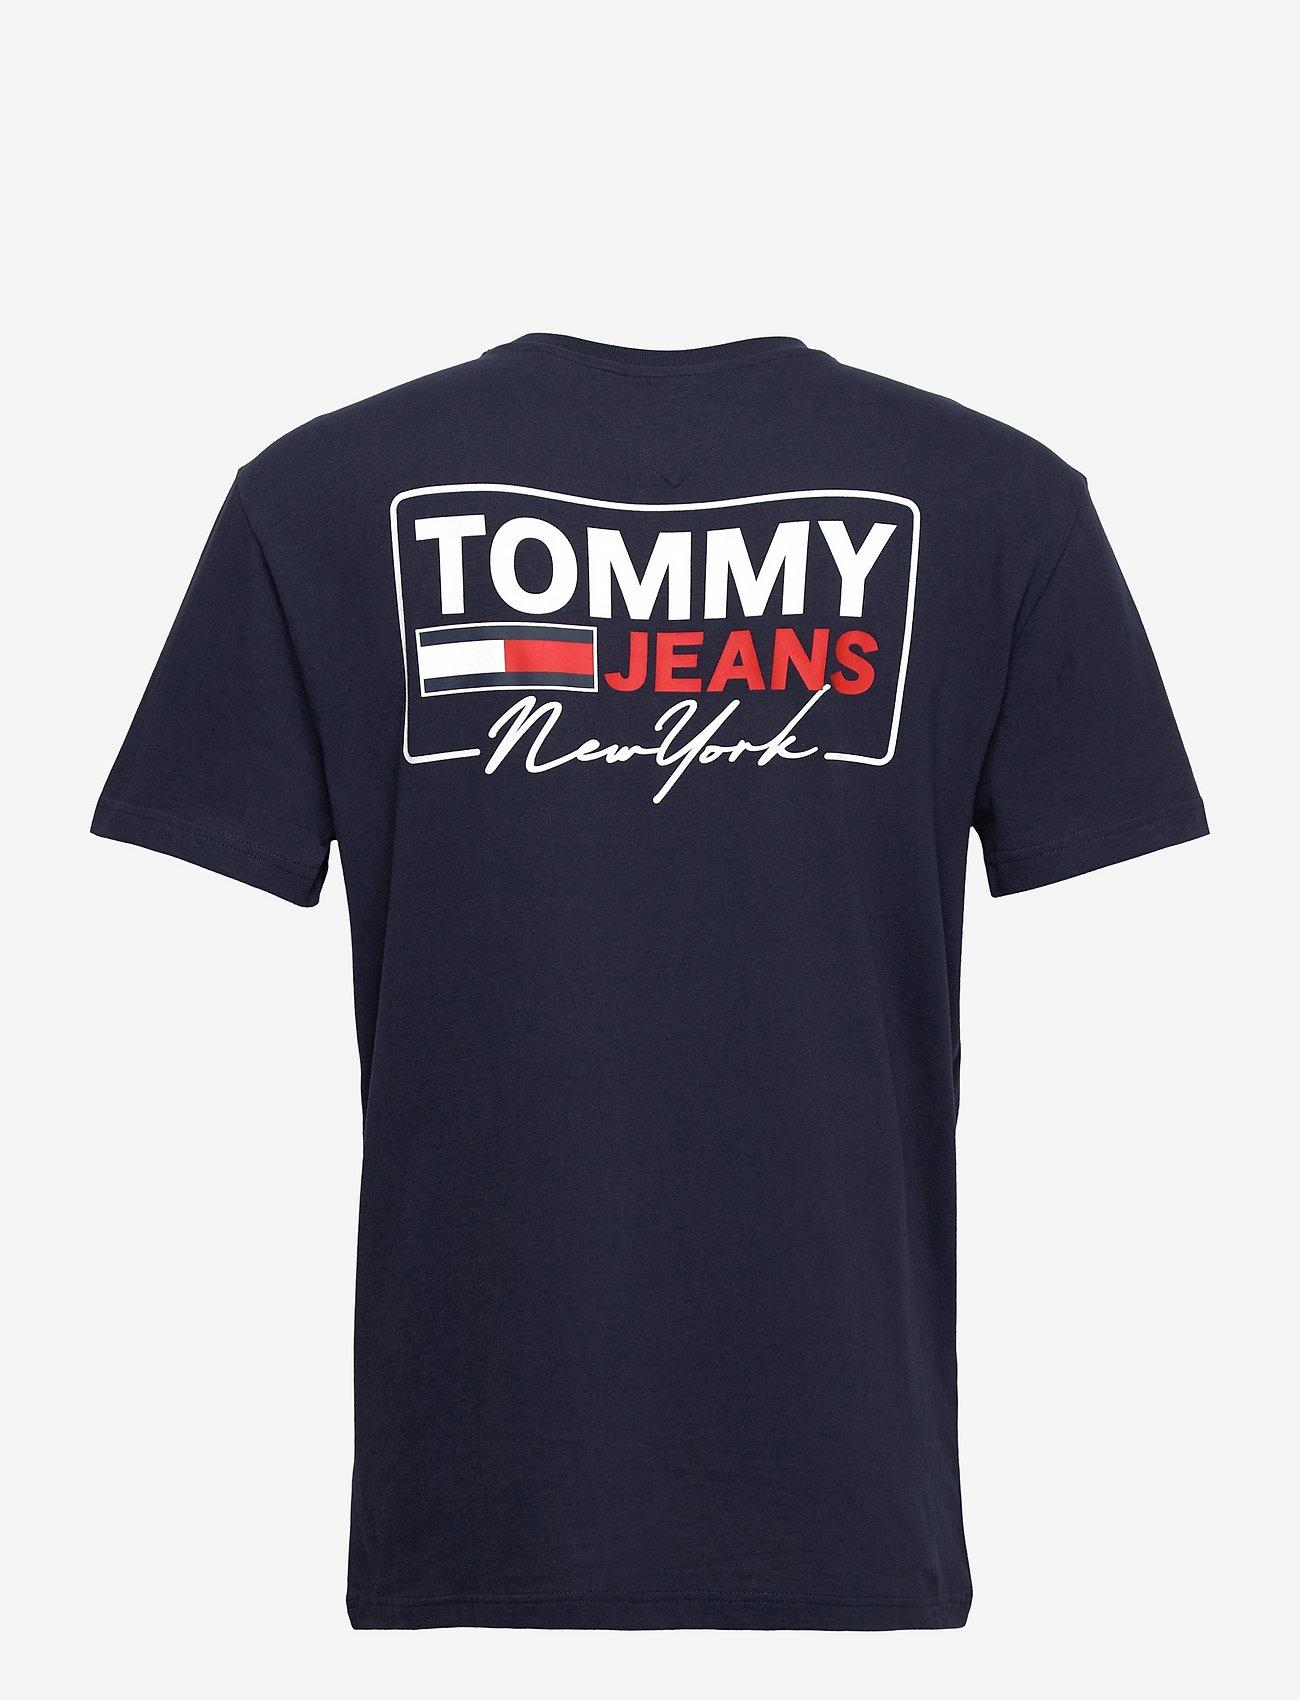 Tommy Jeans - TJM NY SCRIPT BOX BACK LOGO TEE - kortärmade t-shirts - twilight navy - 1